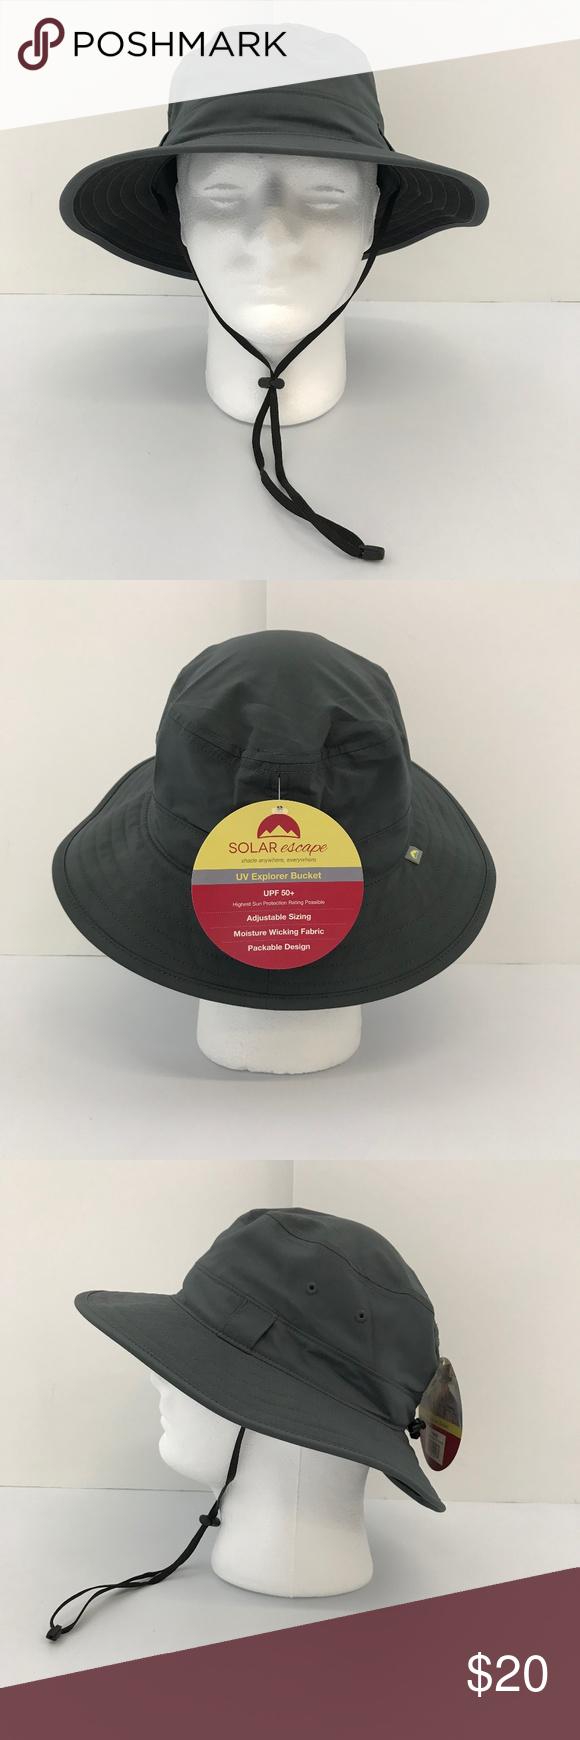 cefaf9a386625 Solar Escape UV Explorer Bucket Hat New with Tags! Solar Escape UV Explorer  Bucket Hat